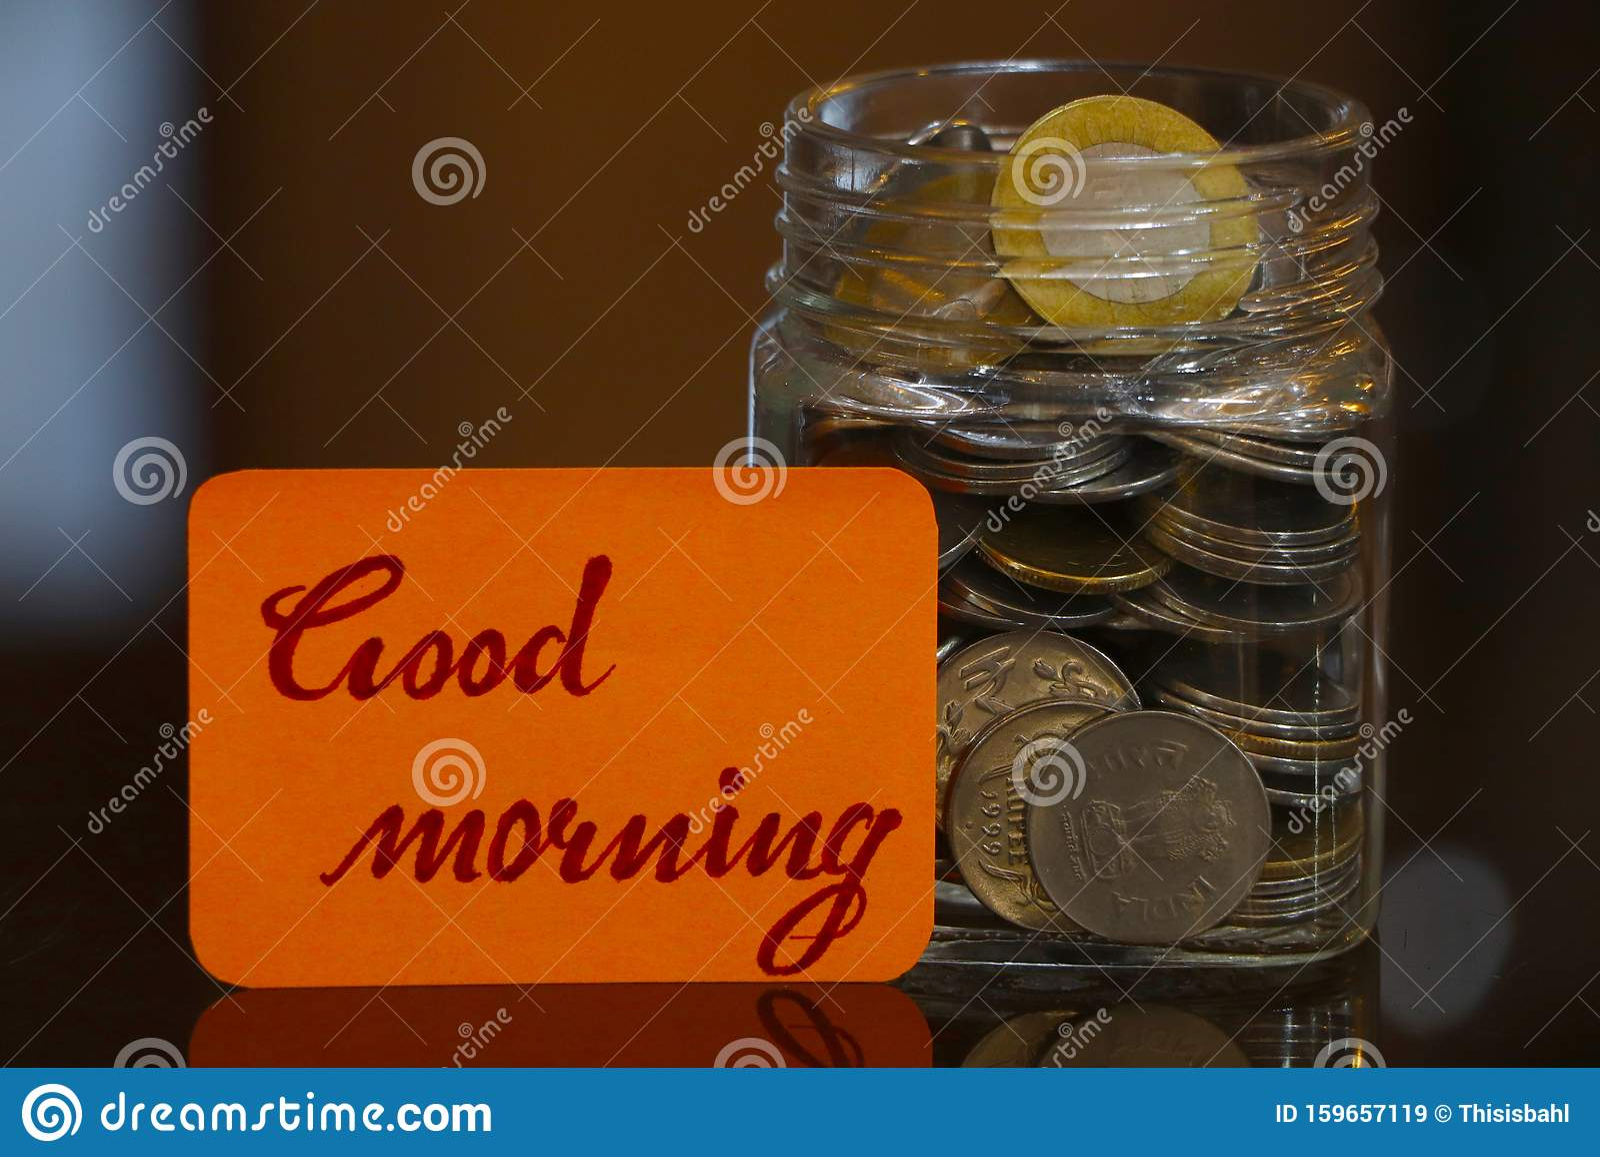 Good Morning. Money Jar.